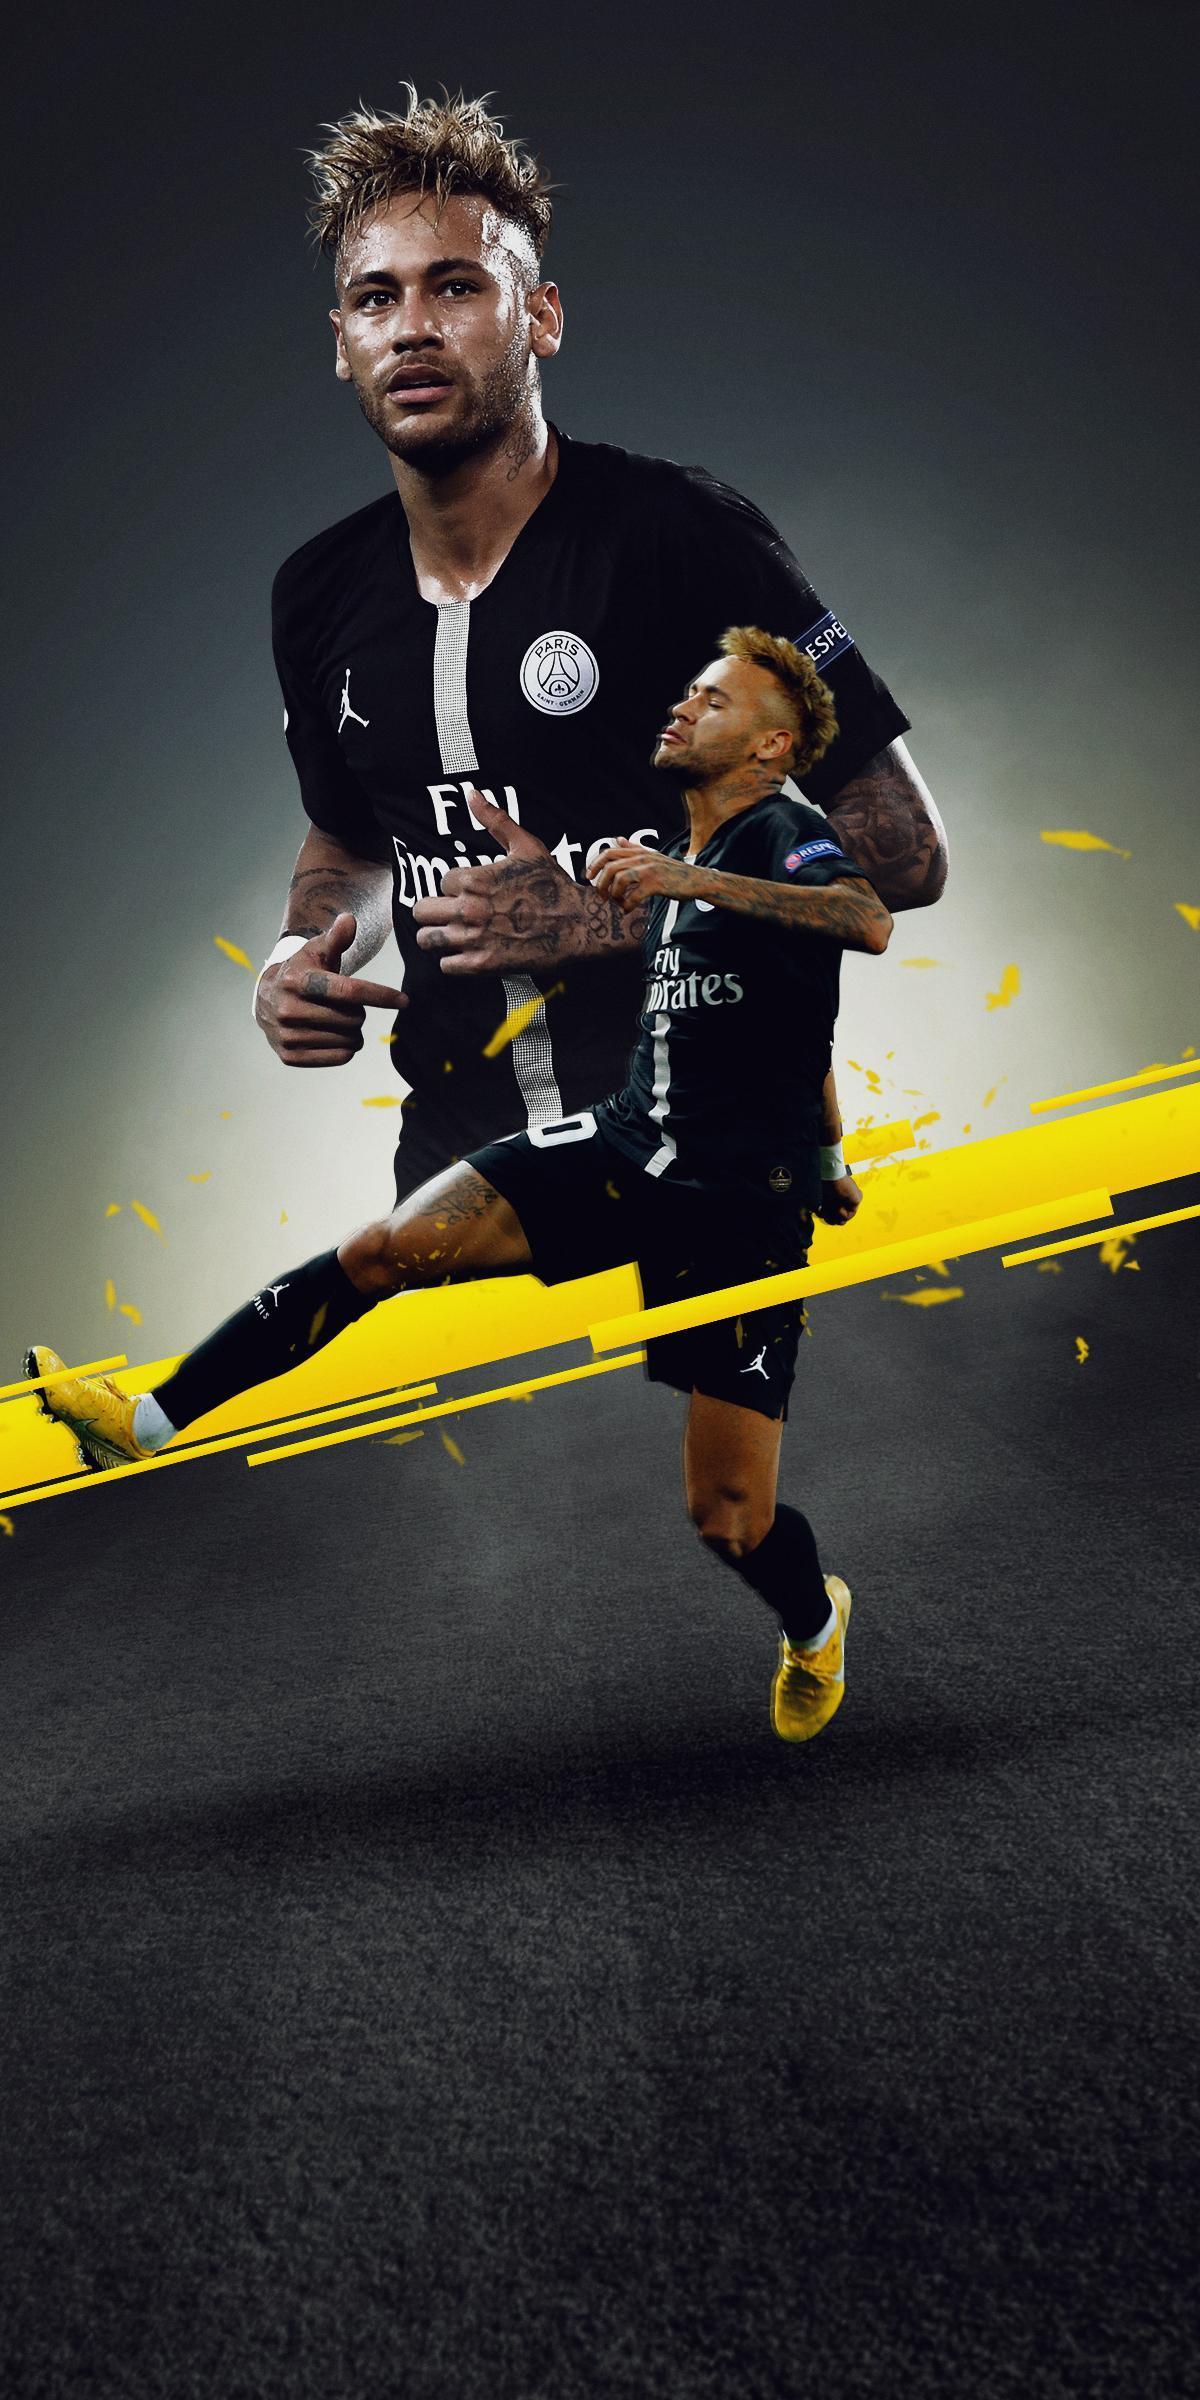 Neymar PSG 2021 Wallpapers - Wallpaper Cave